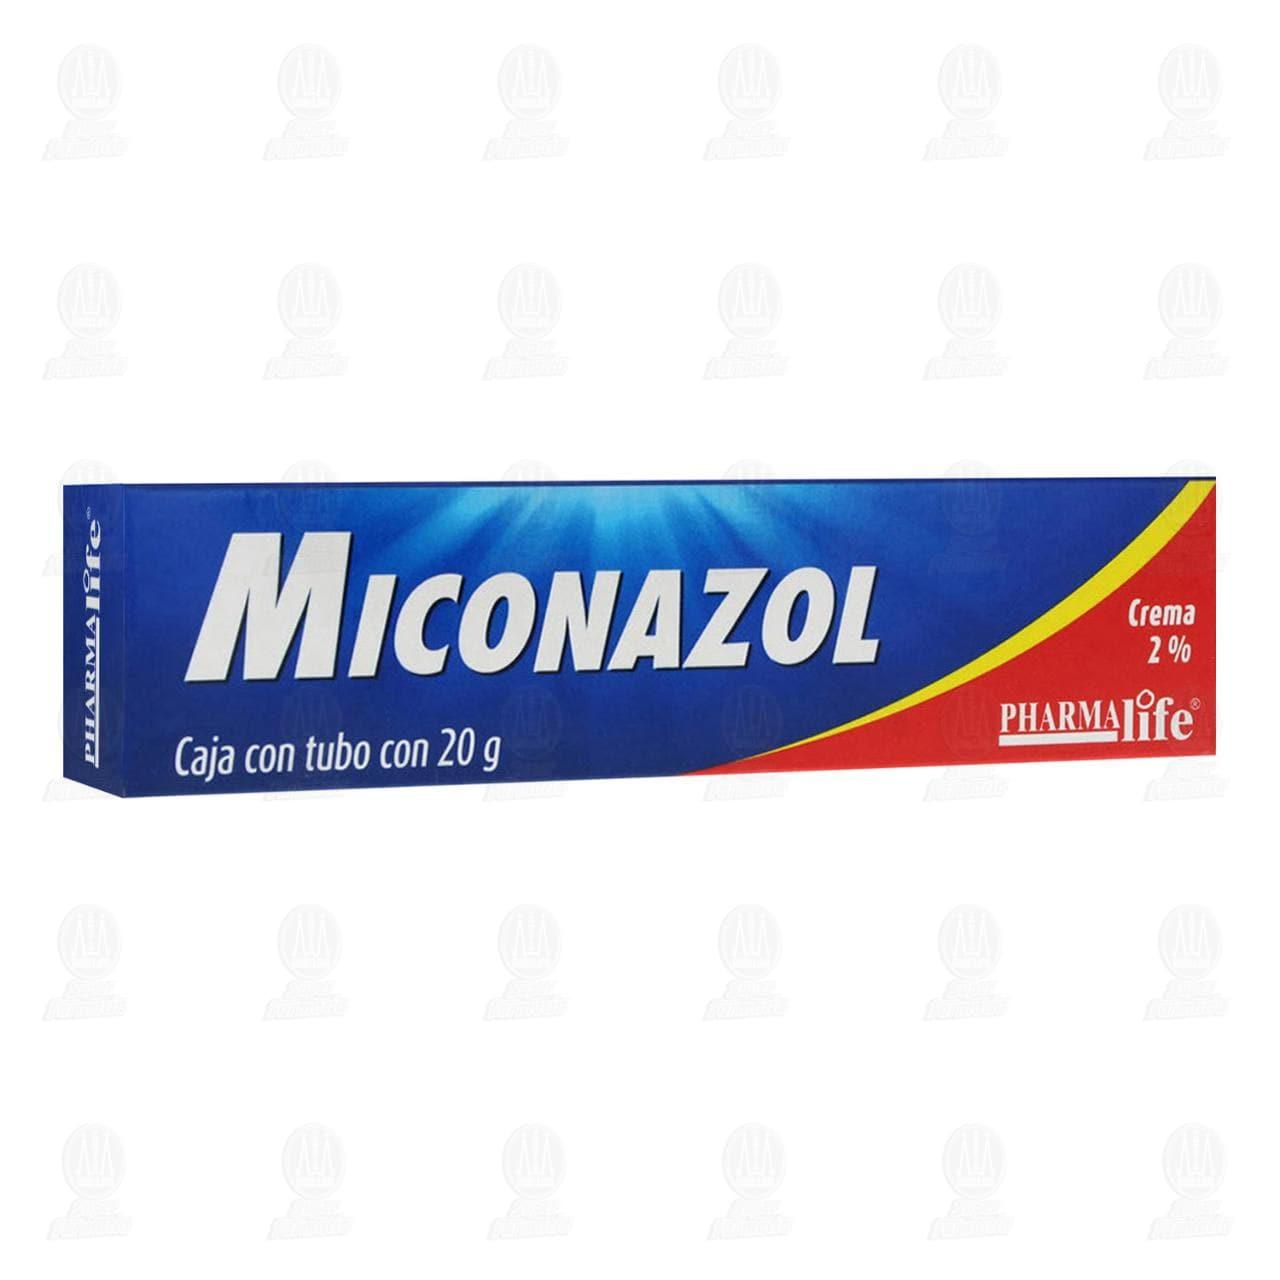 Comprar Miconazol Crema 2% 20gr Pharmalife en Farmacias Guadalajara